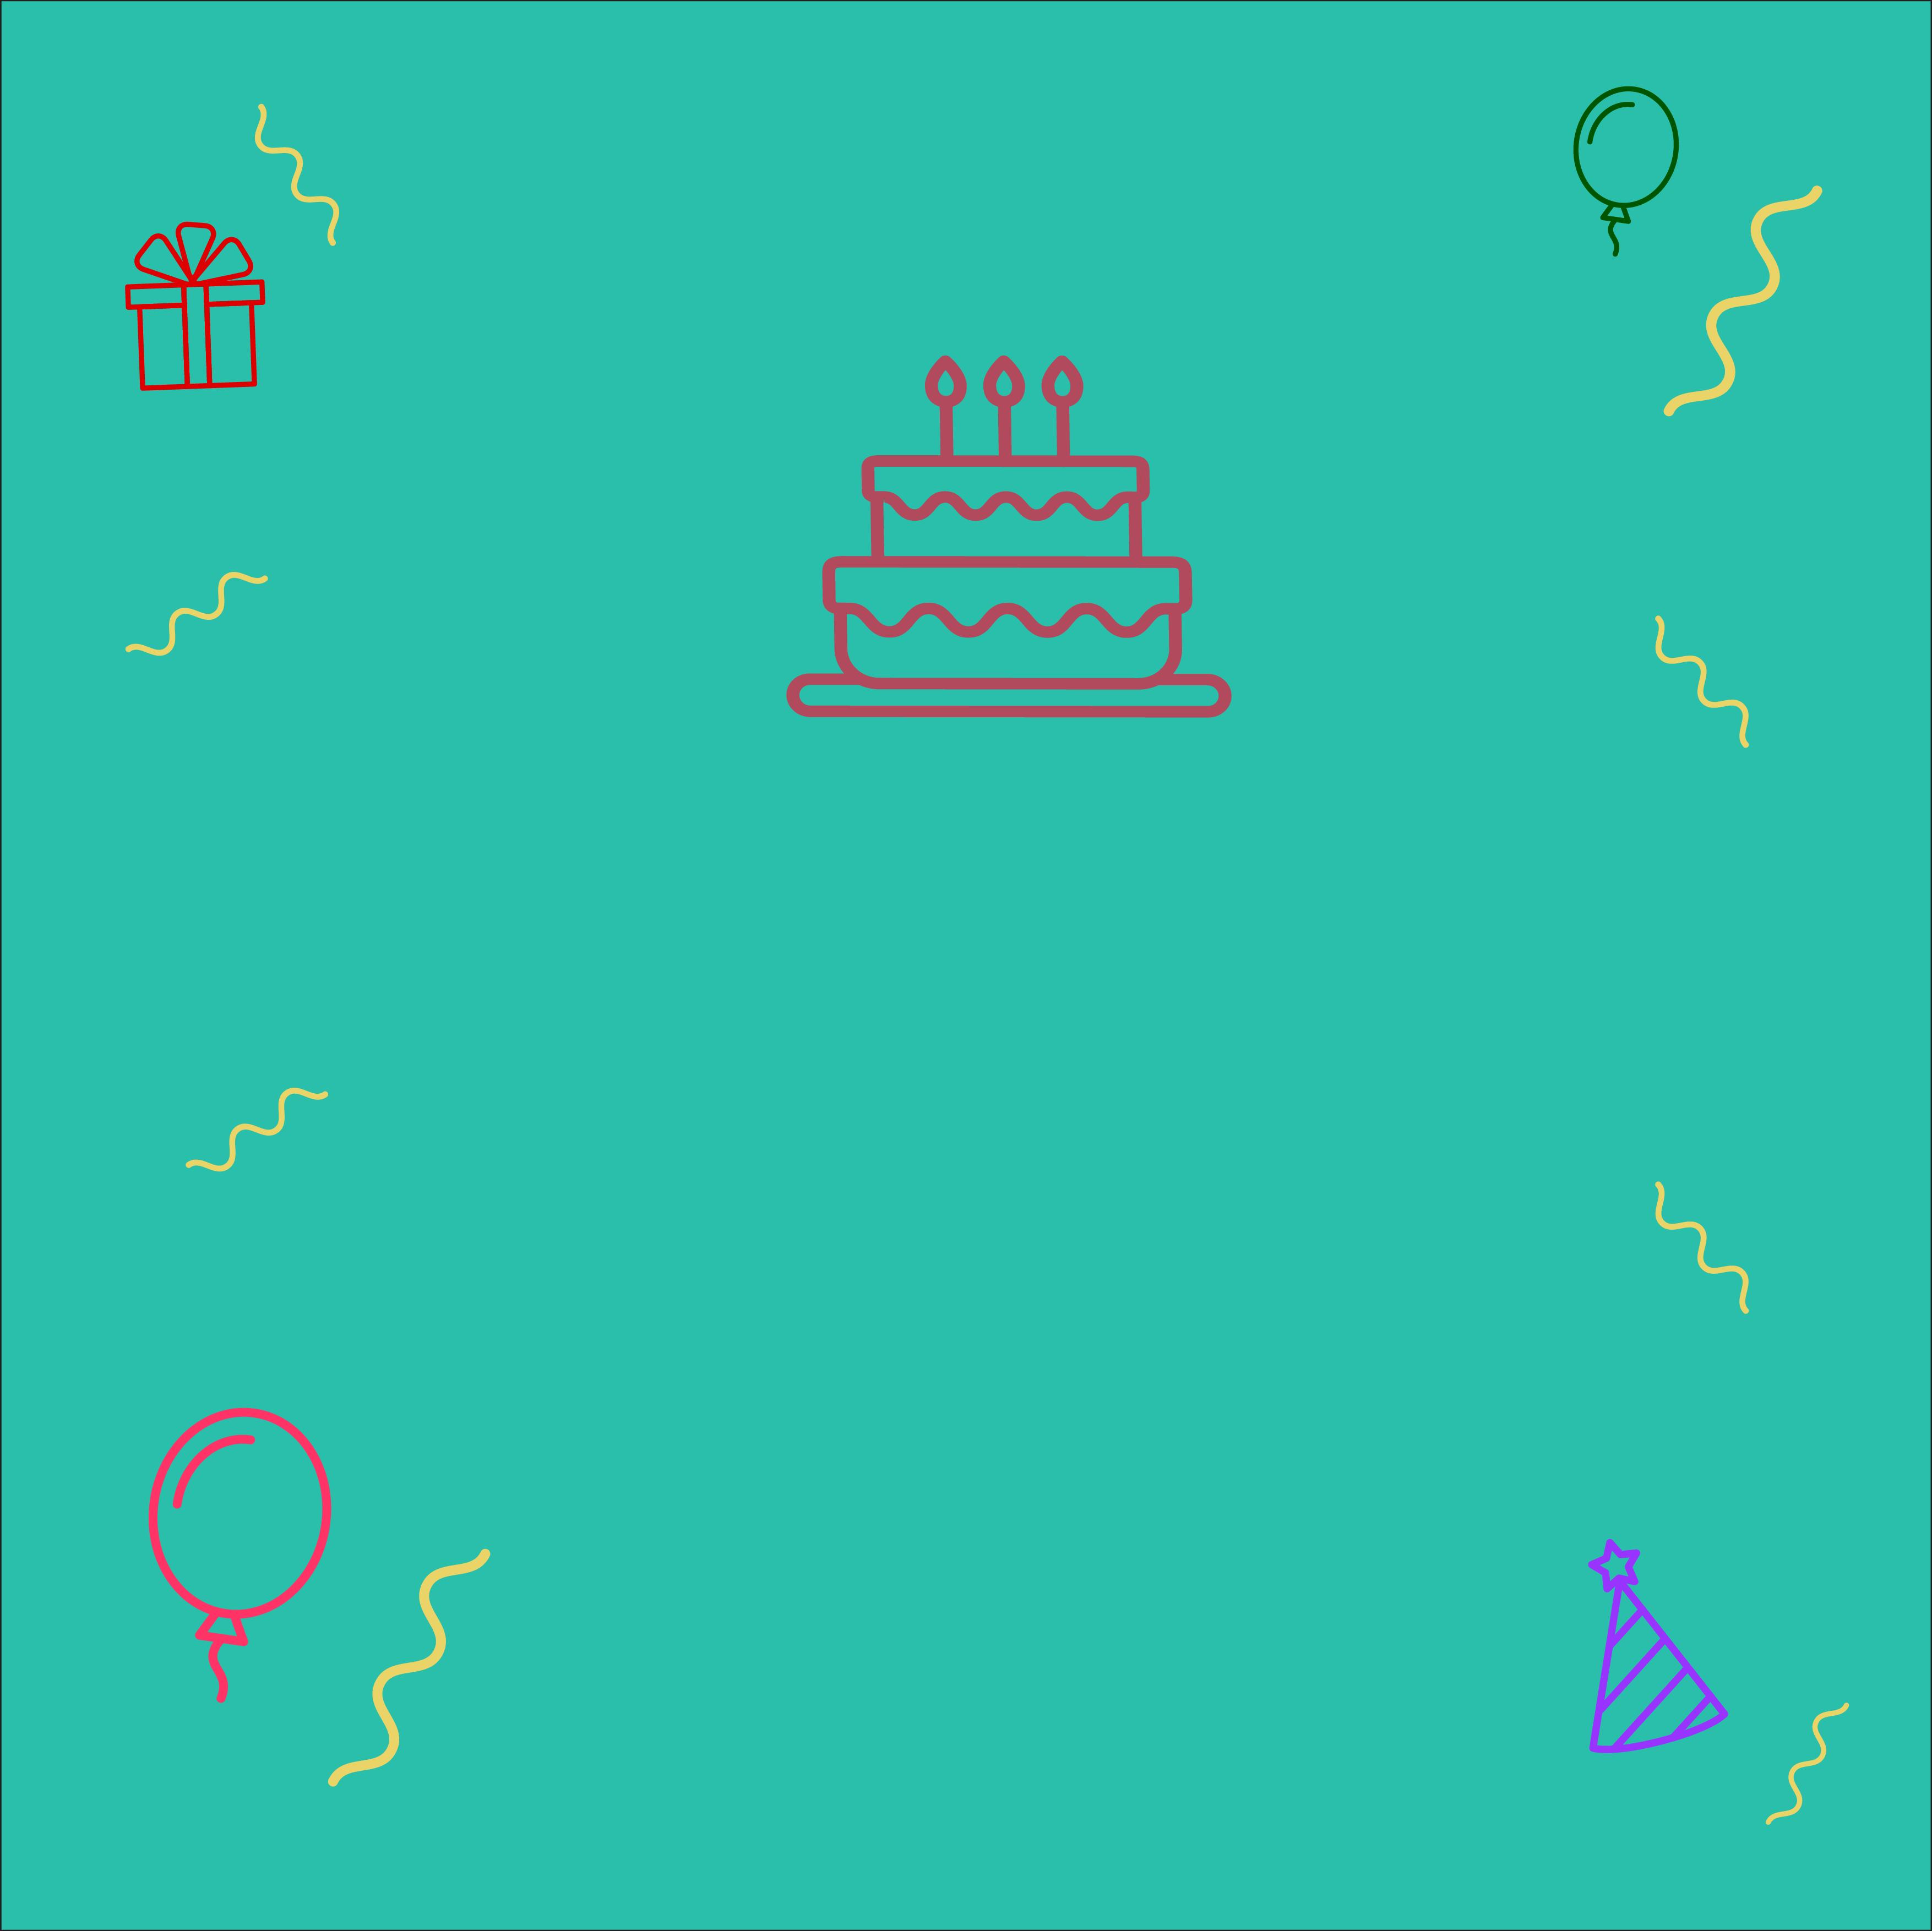 happy-27th-birthday-wishes-07